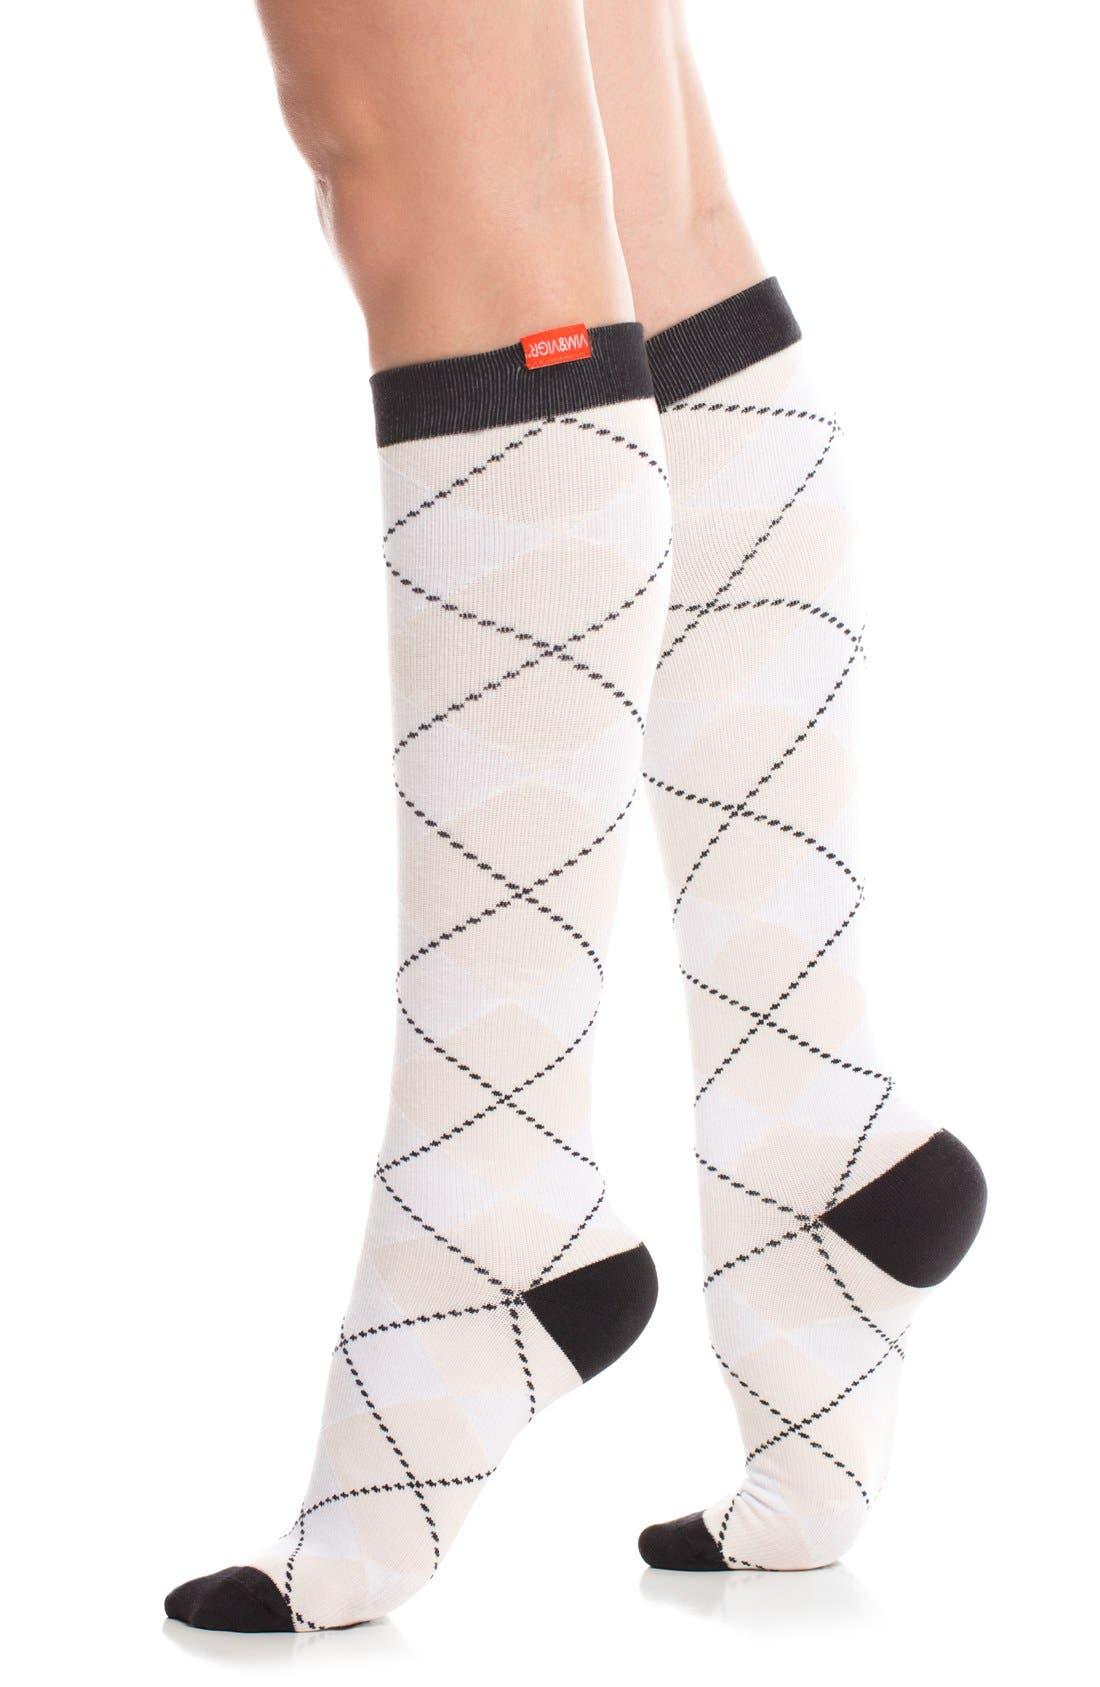 Argyle Graduated Compression Trouser Socks,                             Main thumbnail 1, color,                             White/ Blush